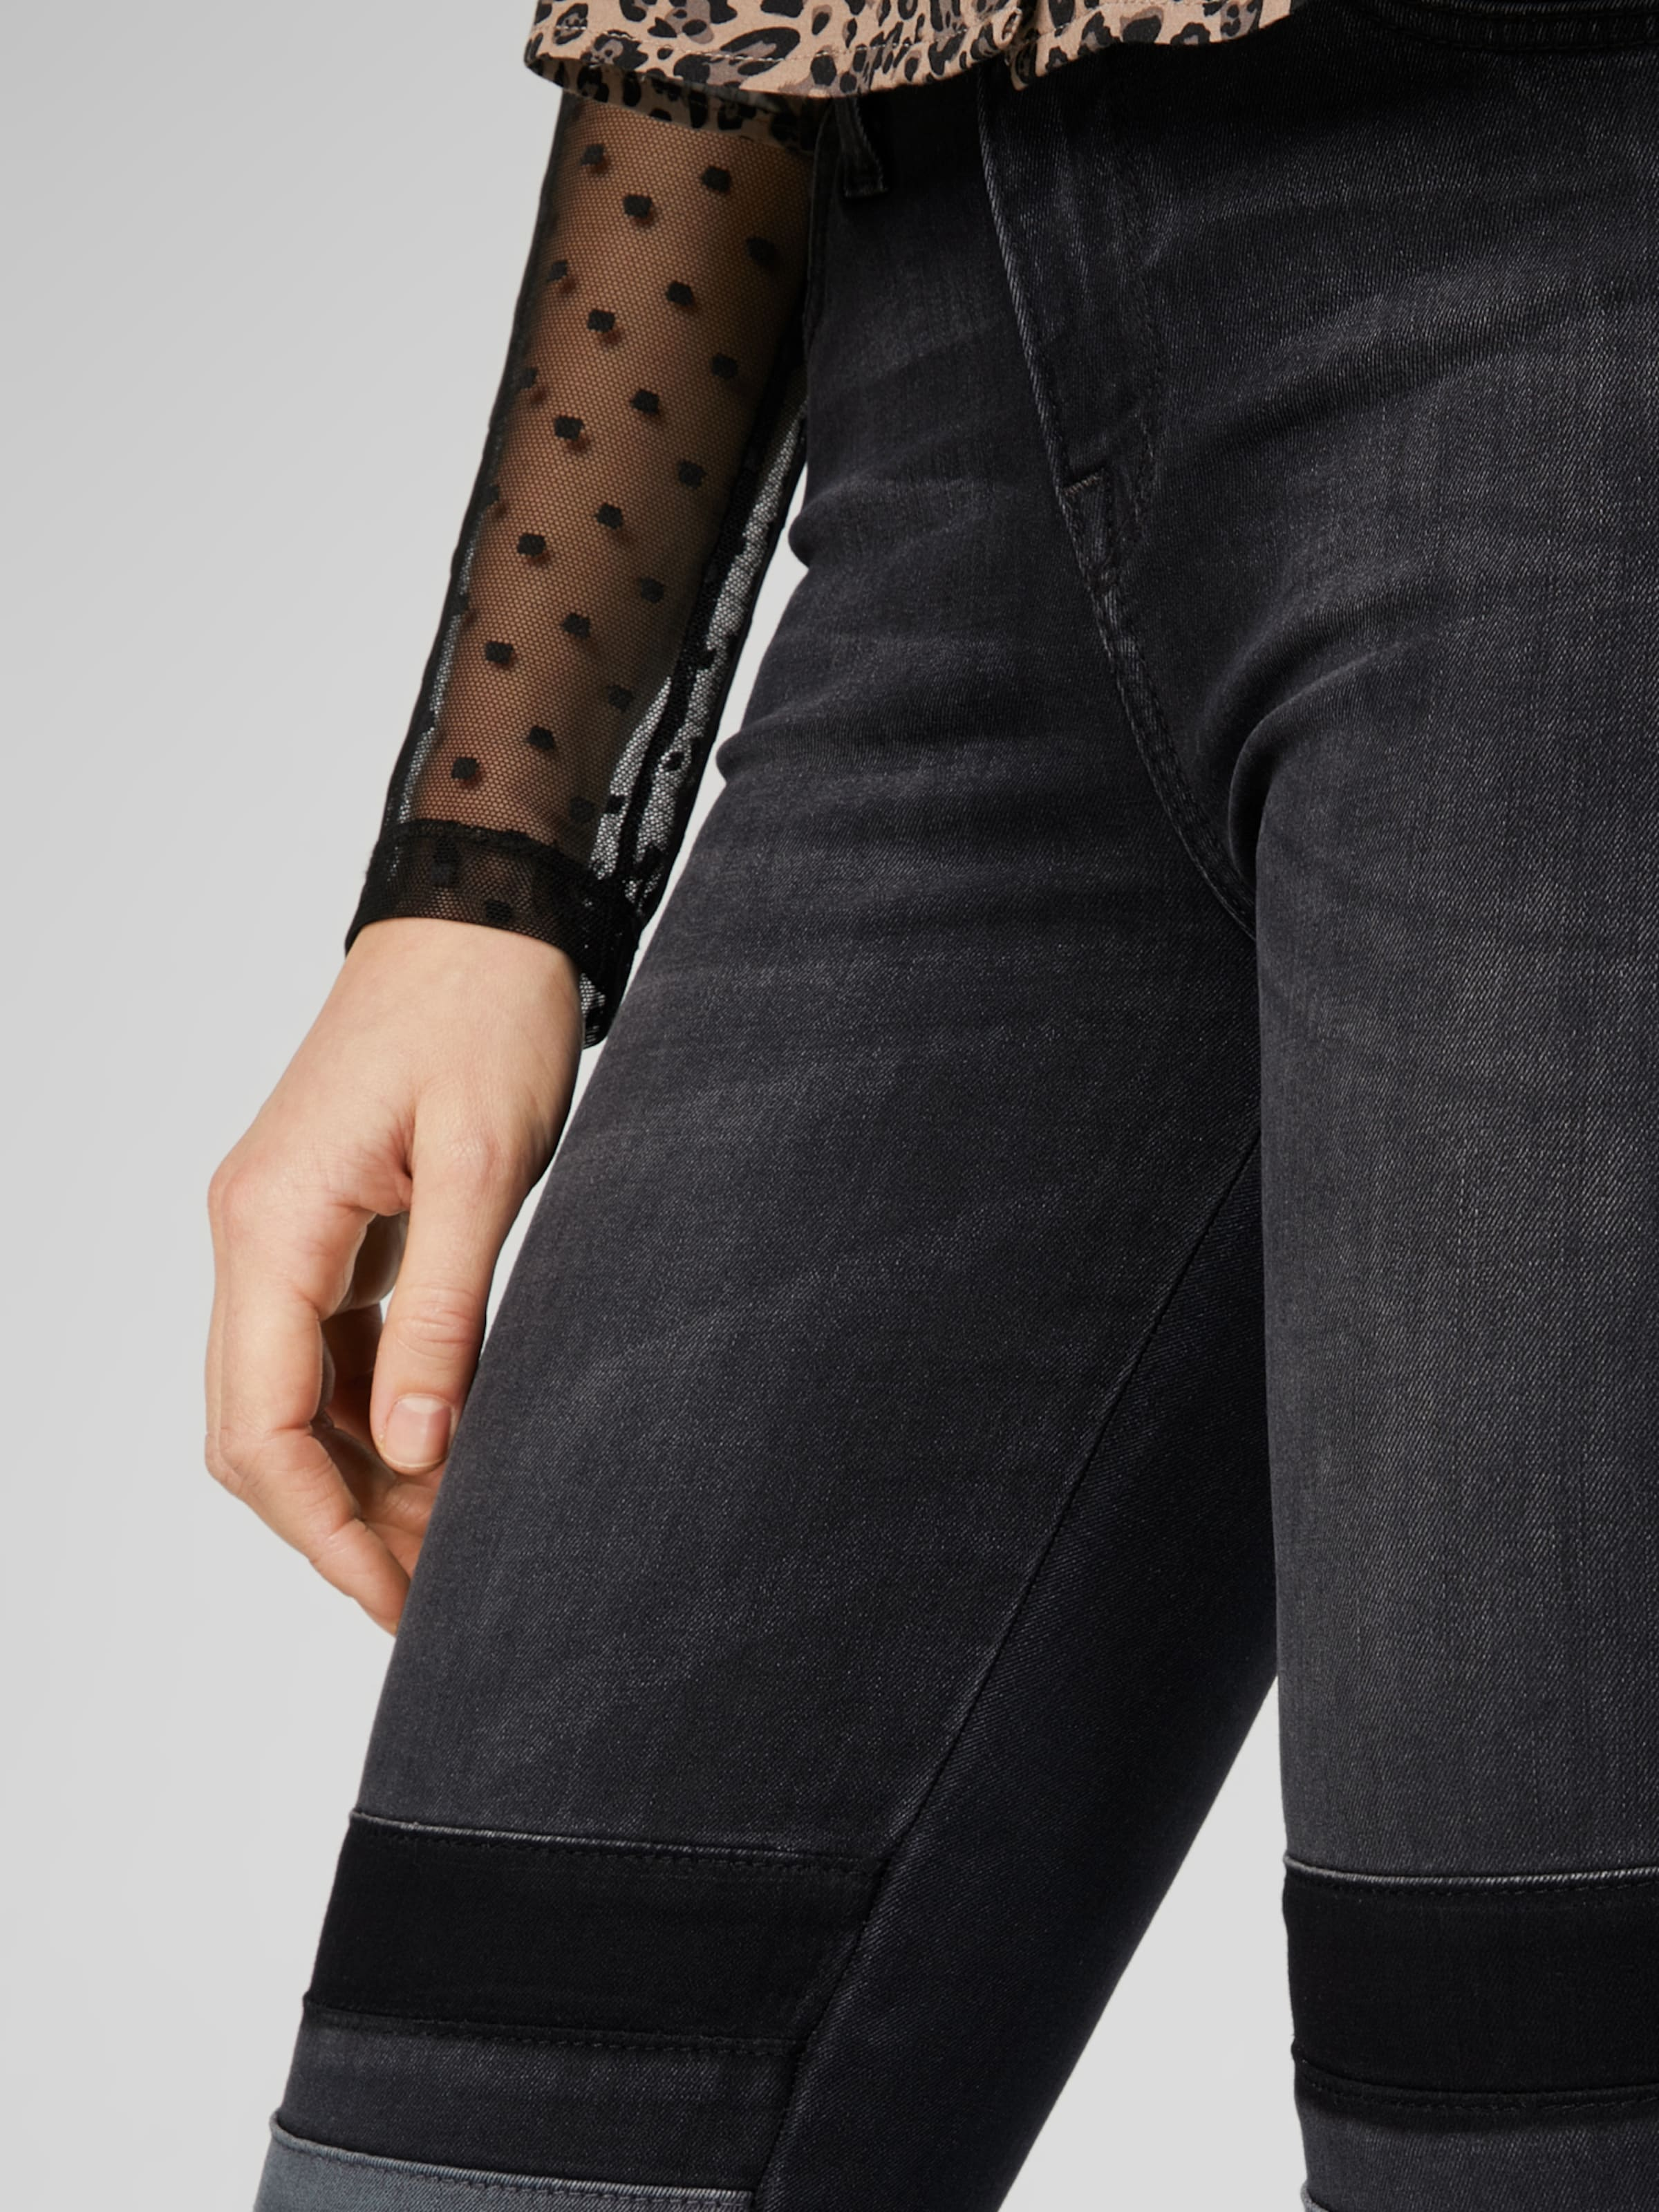 Qualität Original Fabrikpreis Lee 'Jodee' Skinny Jeans Rabatte Verkauf Online Verkauf Großer Verkauf 5P4DJJXtb2